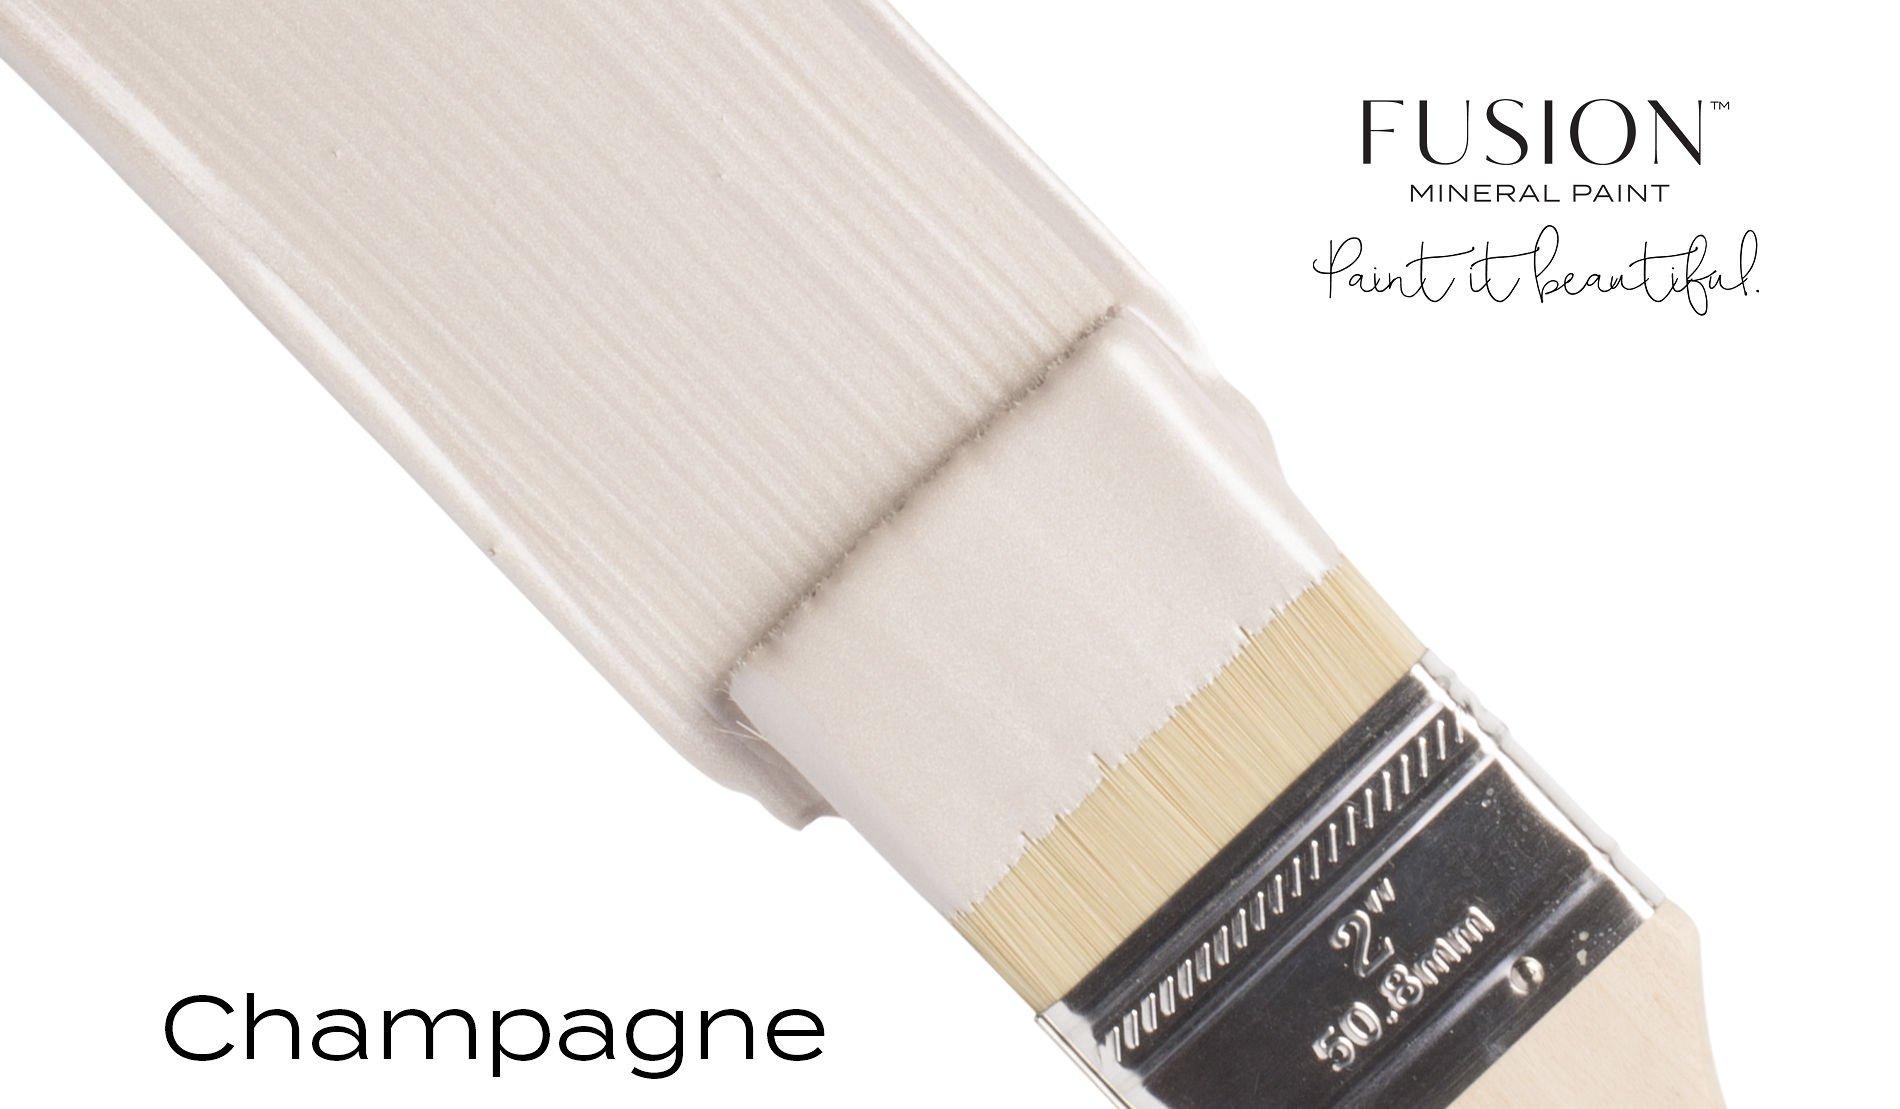 Fusion Mineral Paint Brushstroke - Metallic Champagne | www.raggedy-bits.com